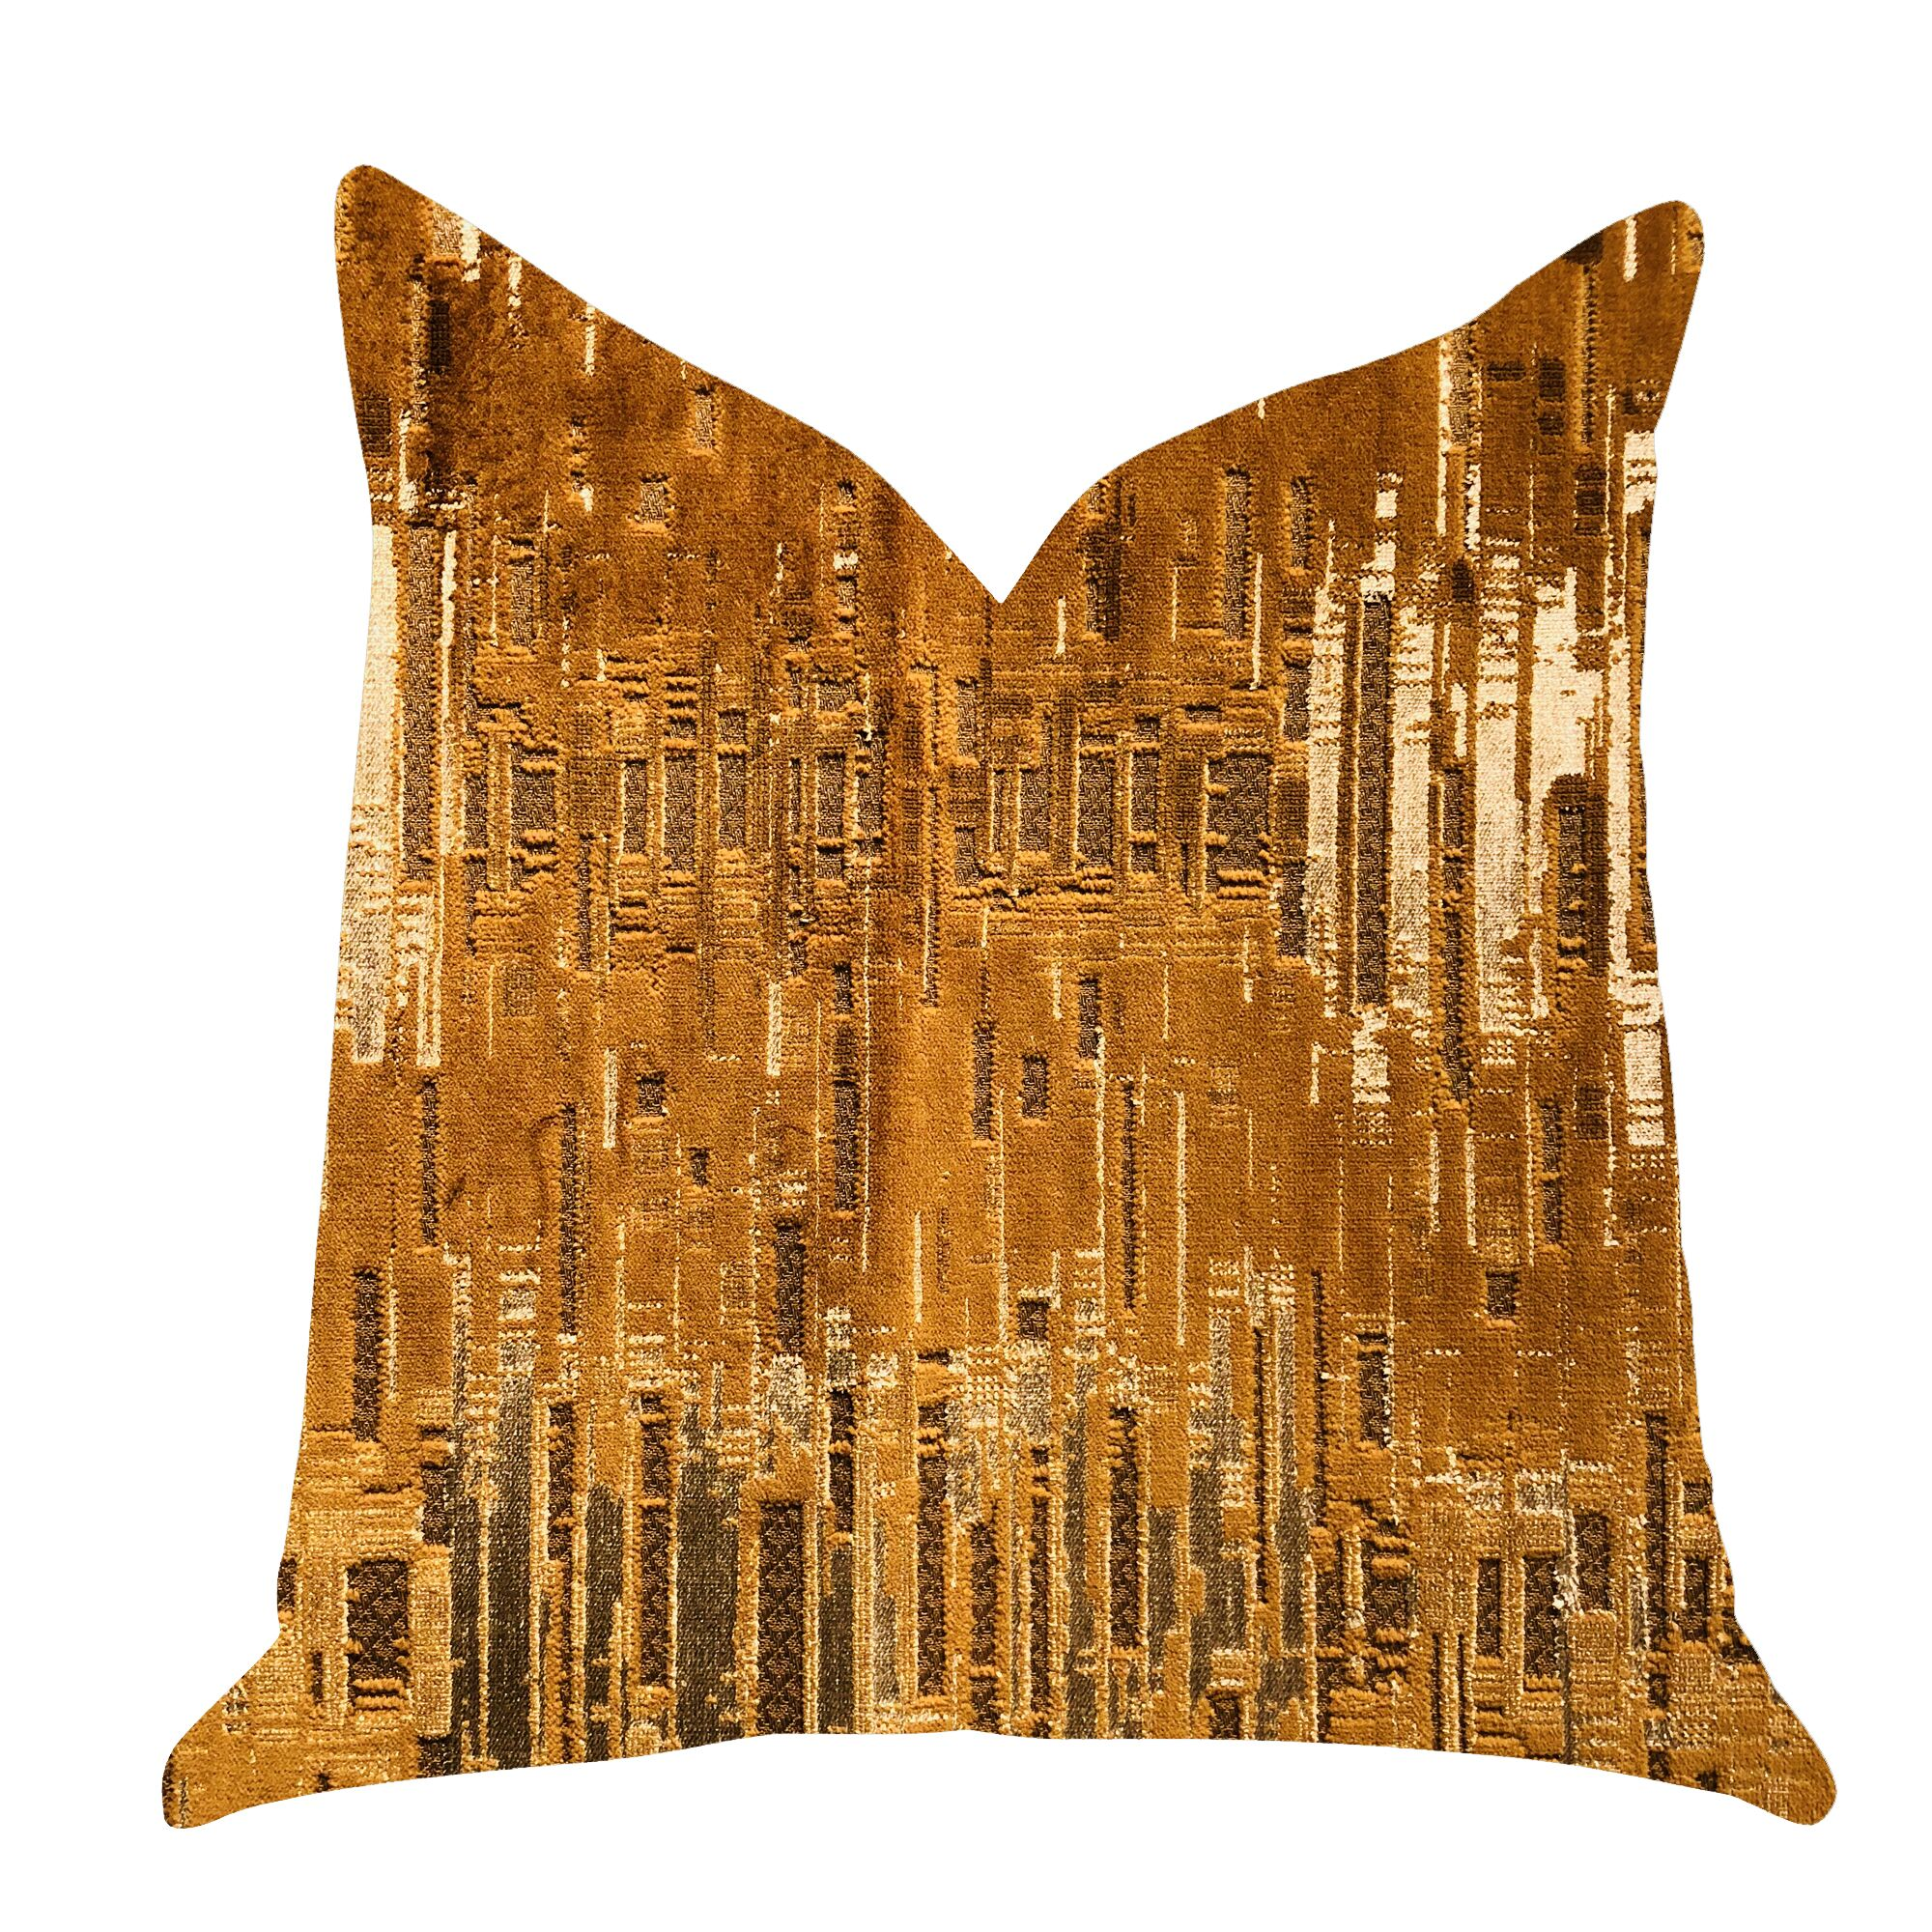 Goodsell Lights Luxury Pillow Size: 26